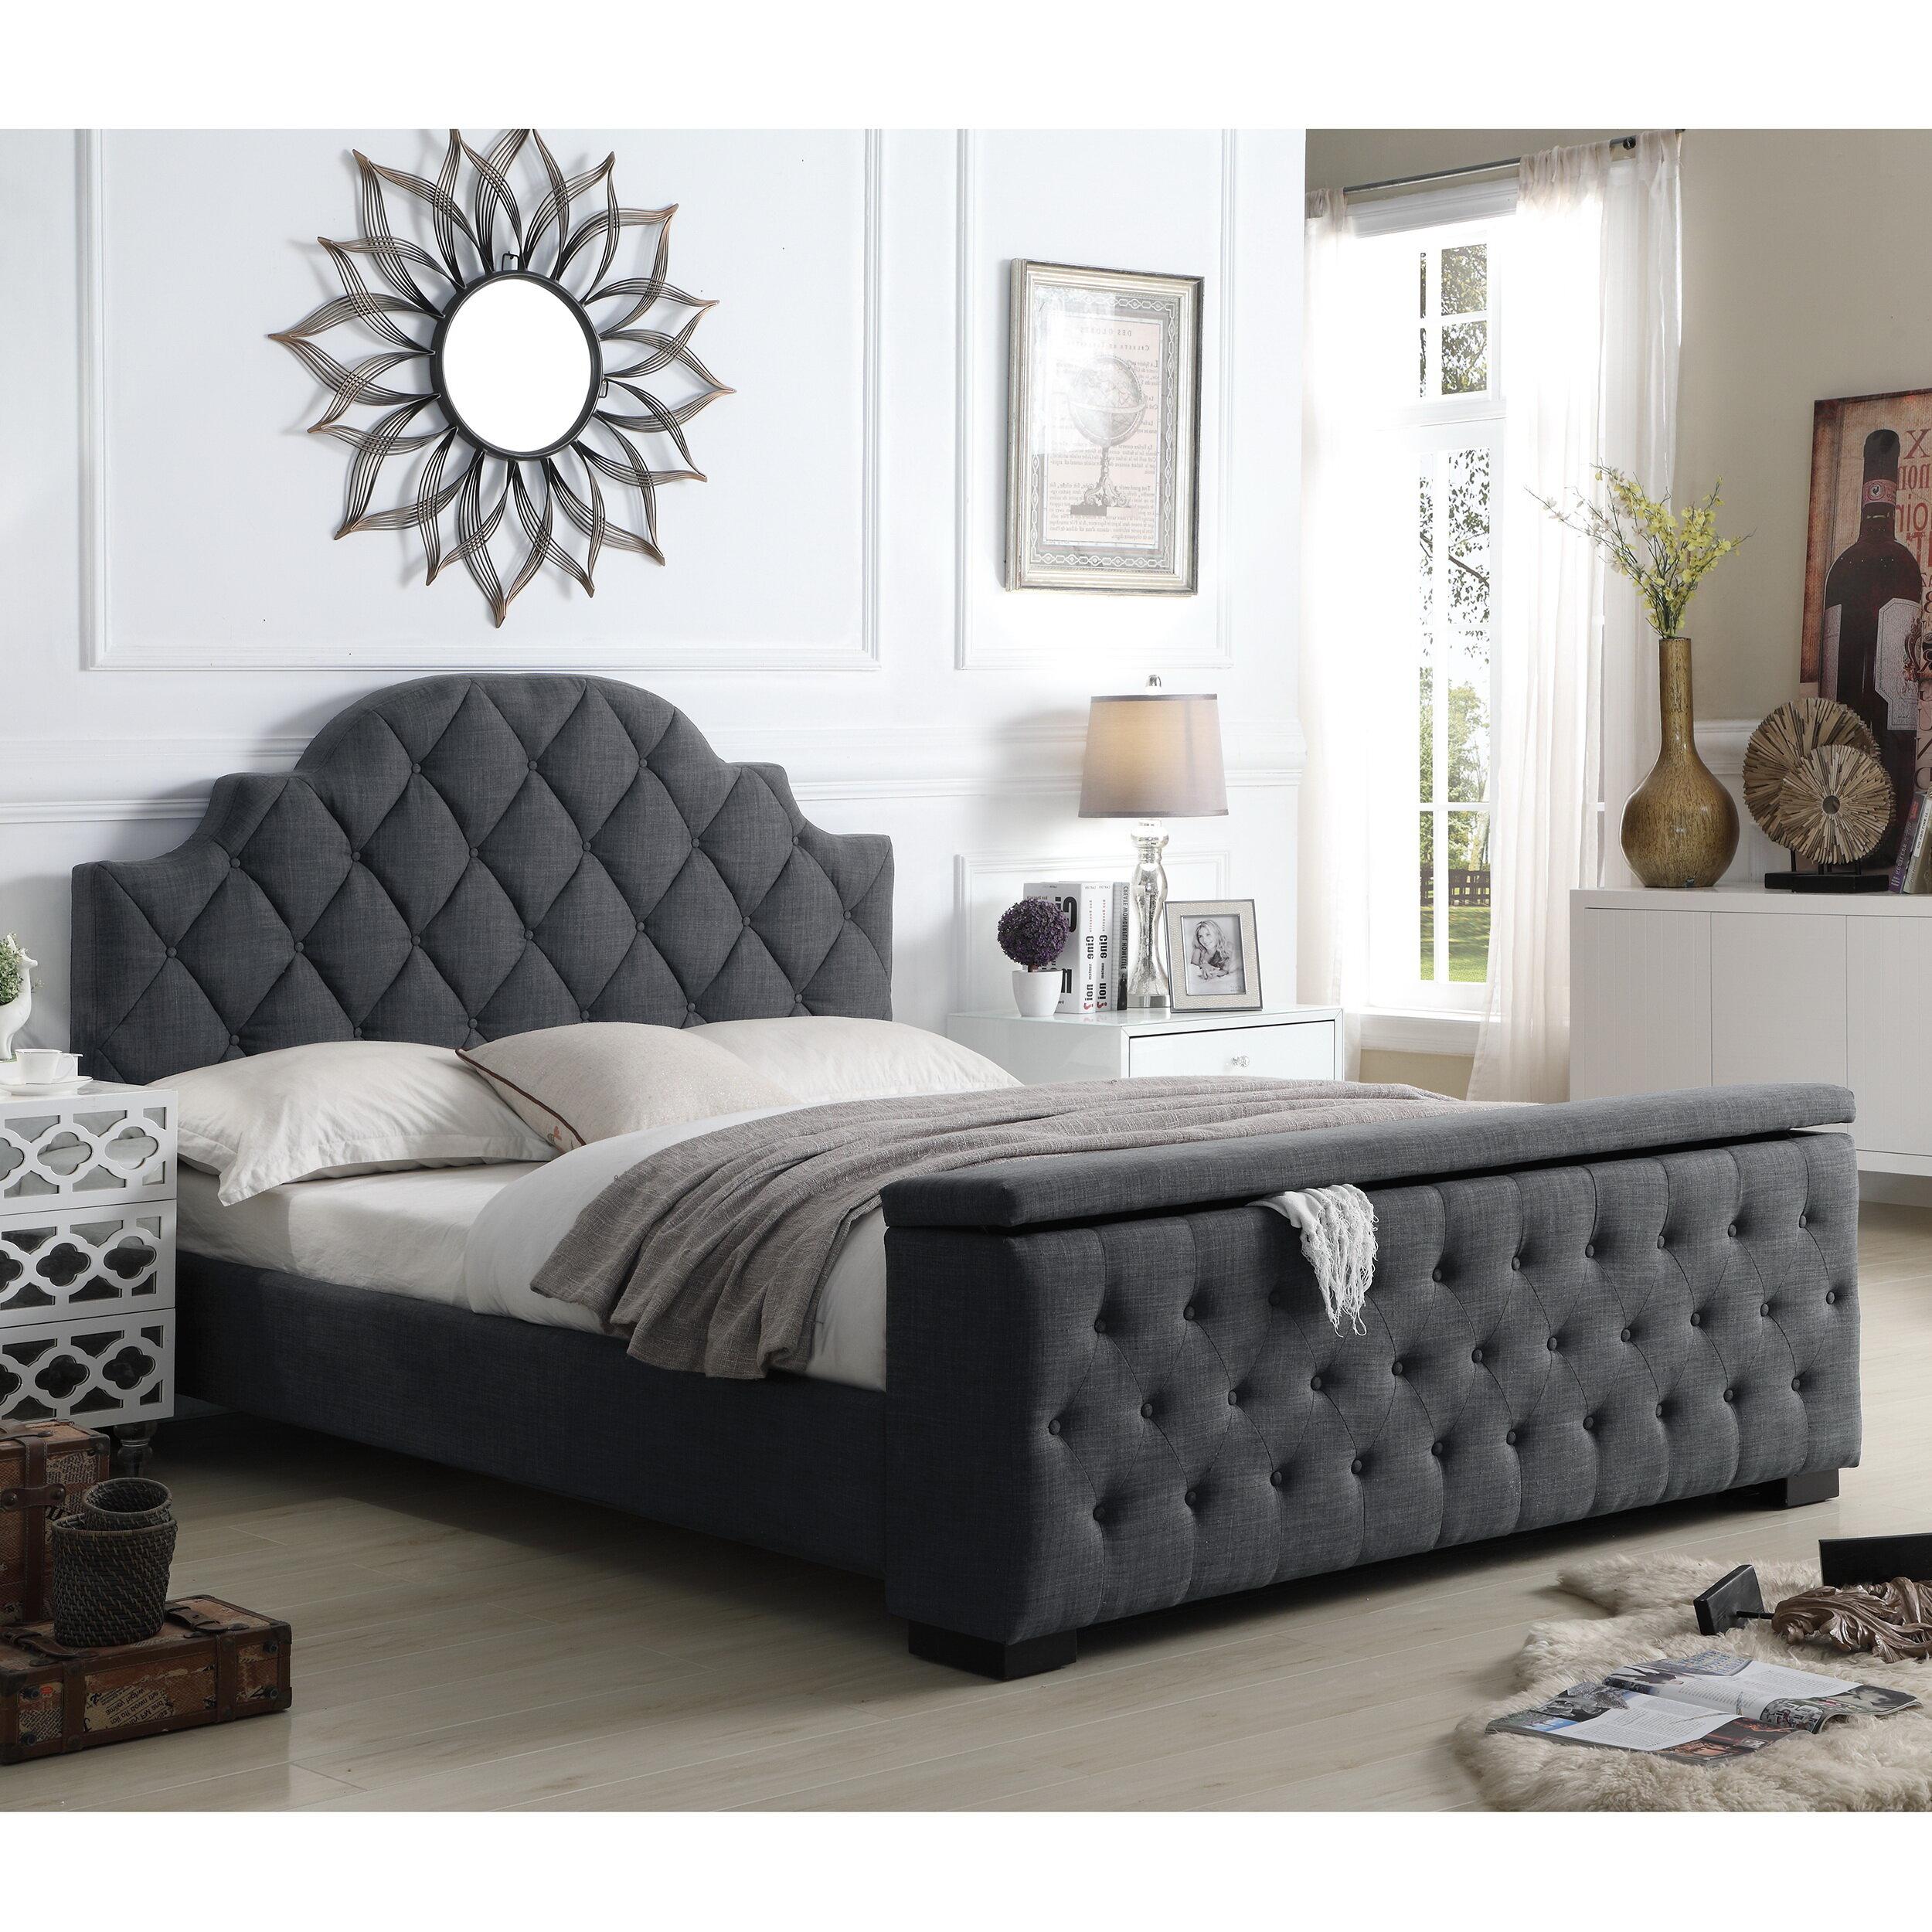 Mistana Thom Tufted Upholstered Storage Standard Bed Reviews